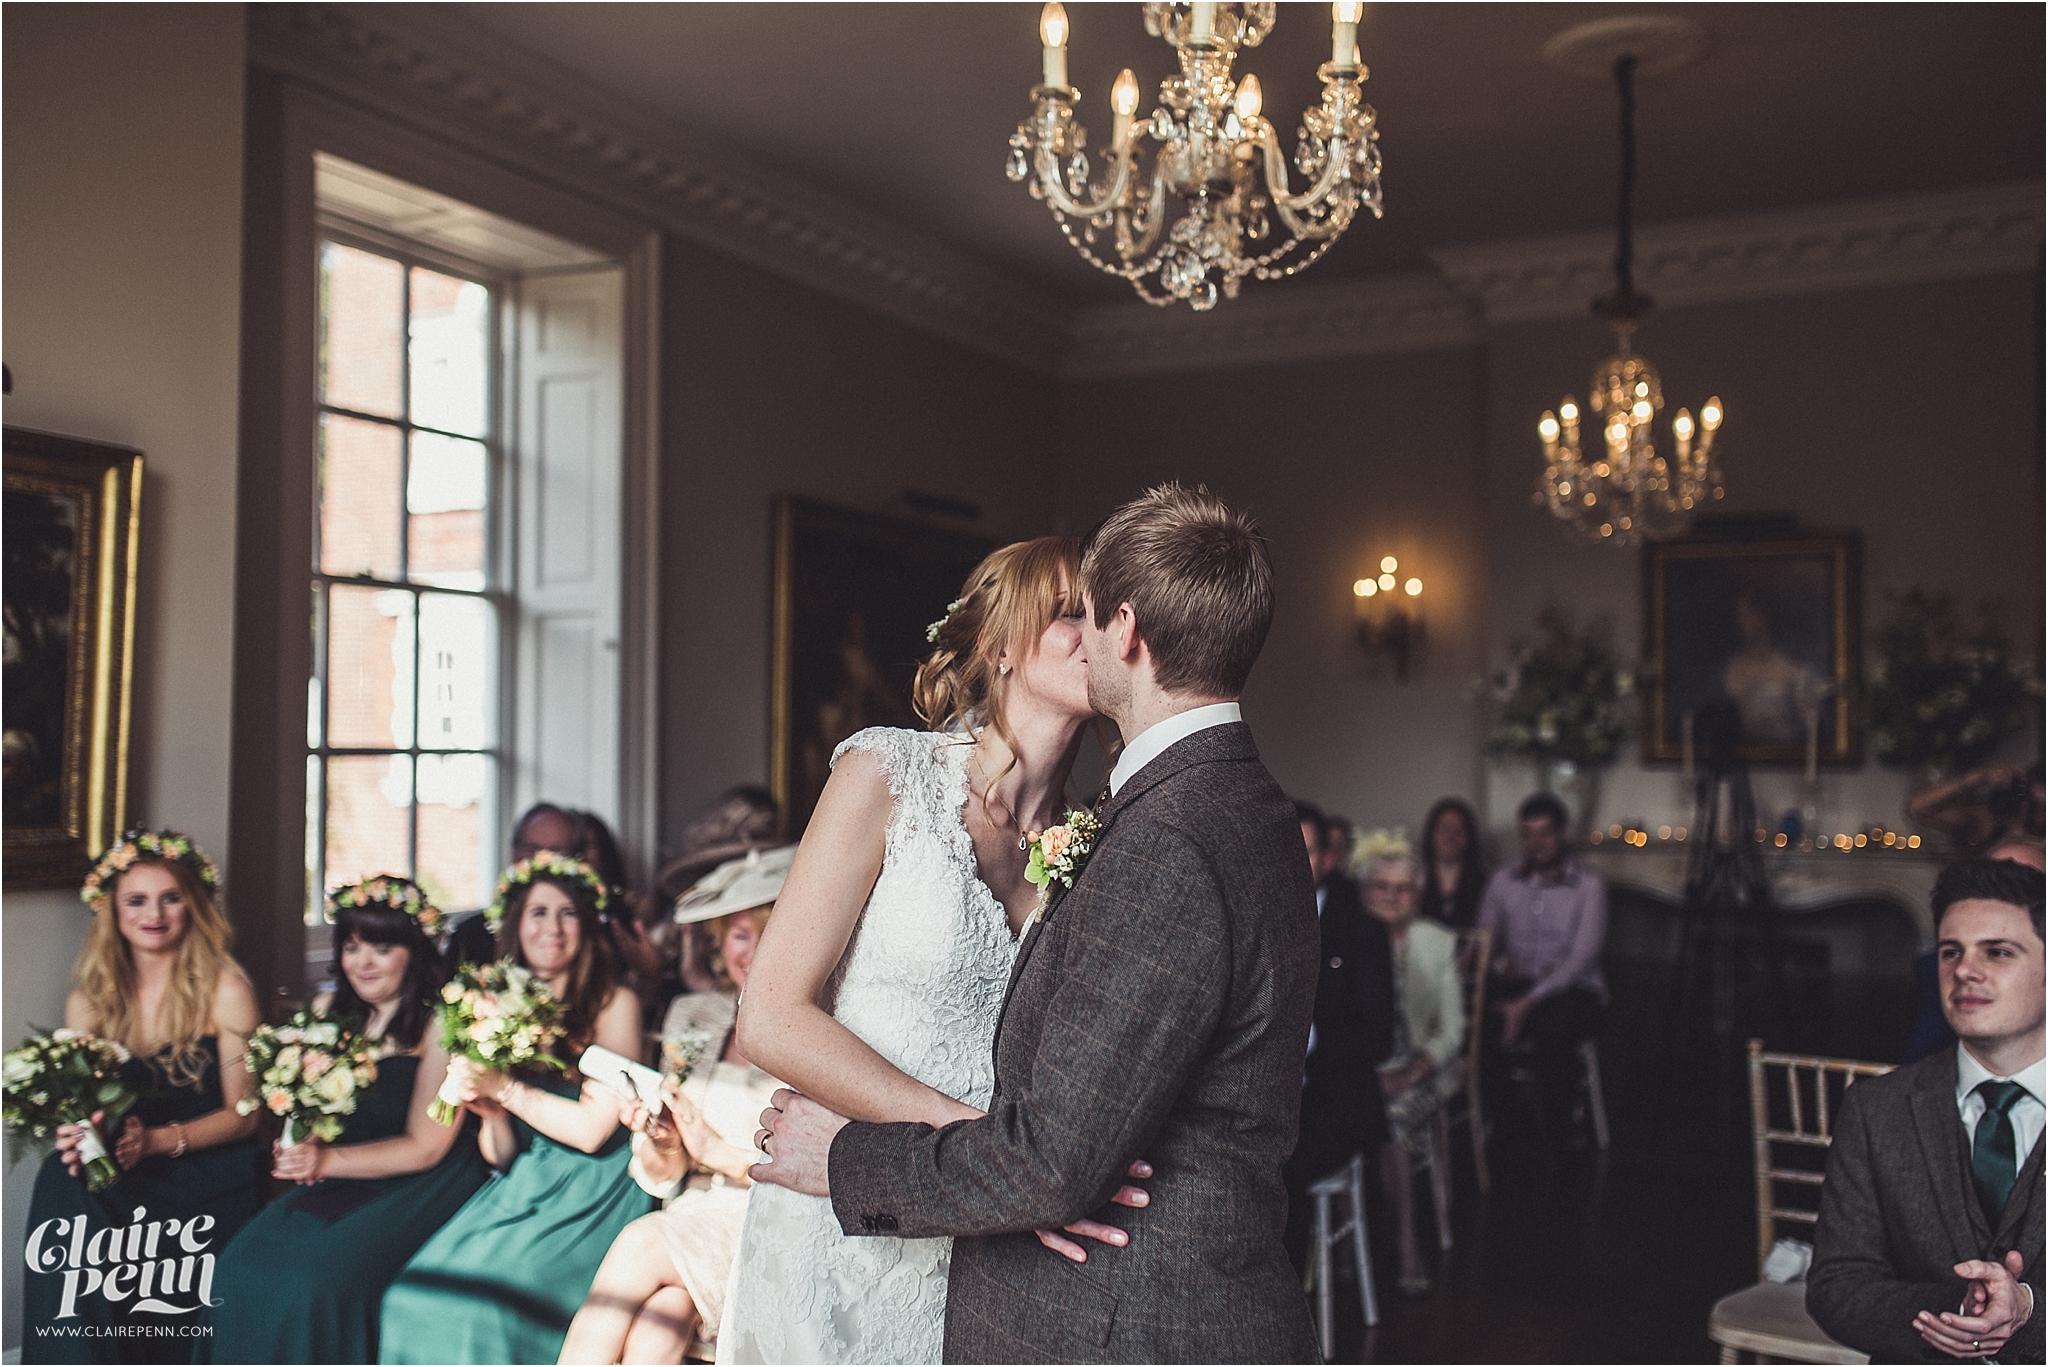 Iscoyd Park wedding, Whitchurch, Cheshire wedding photographer_0021.jpg